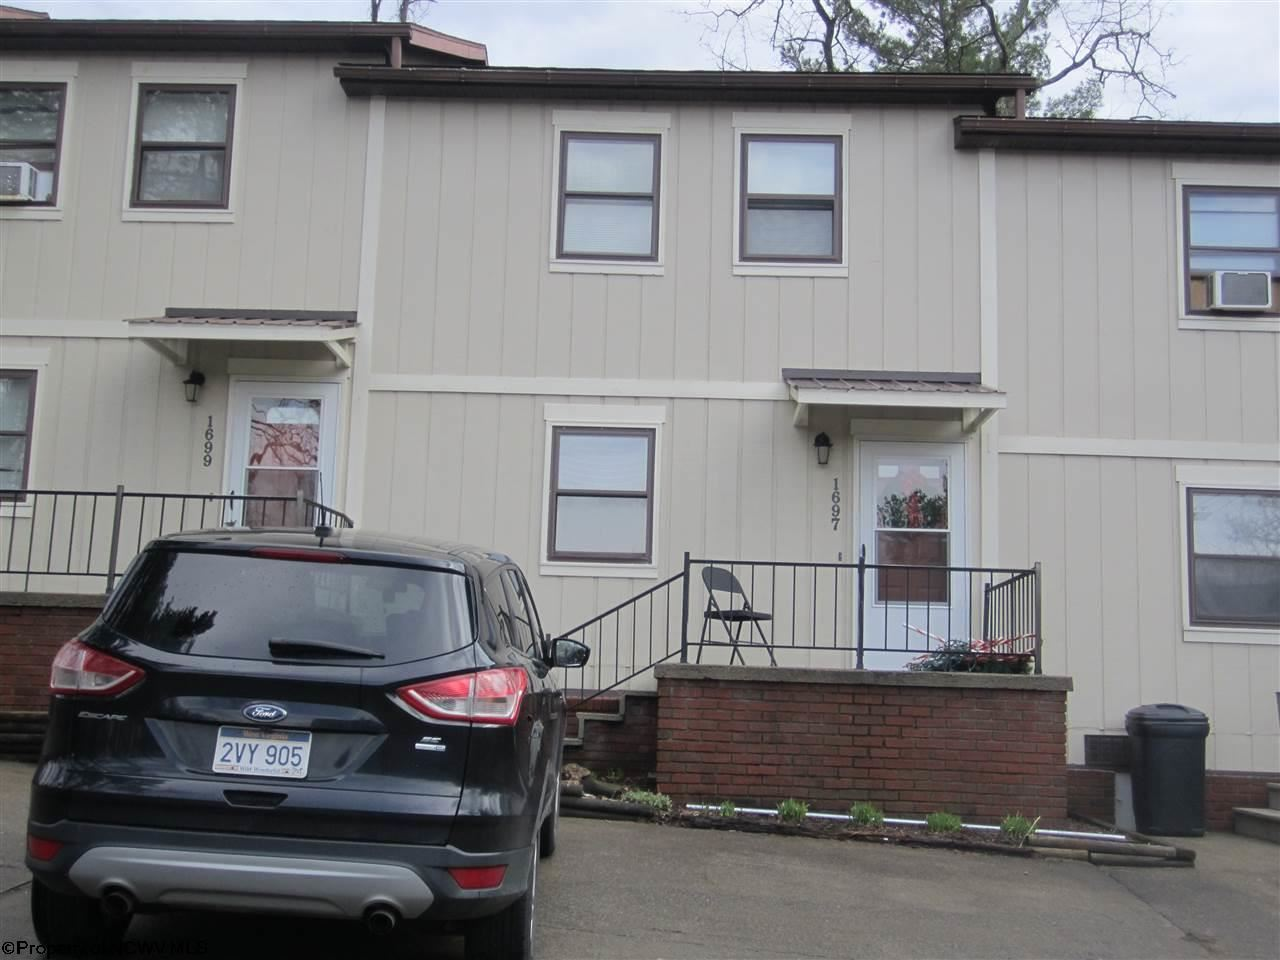 Photo for 1697 Van Voorhis Road, Morgantown, WV 26505 (MLS # 10131225)